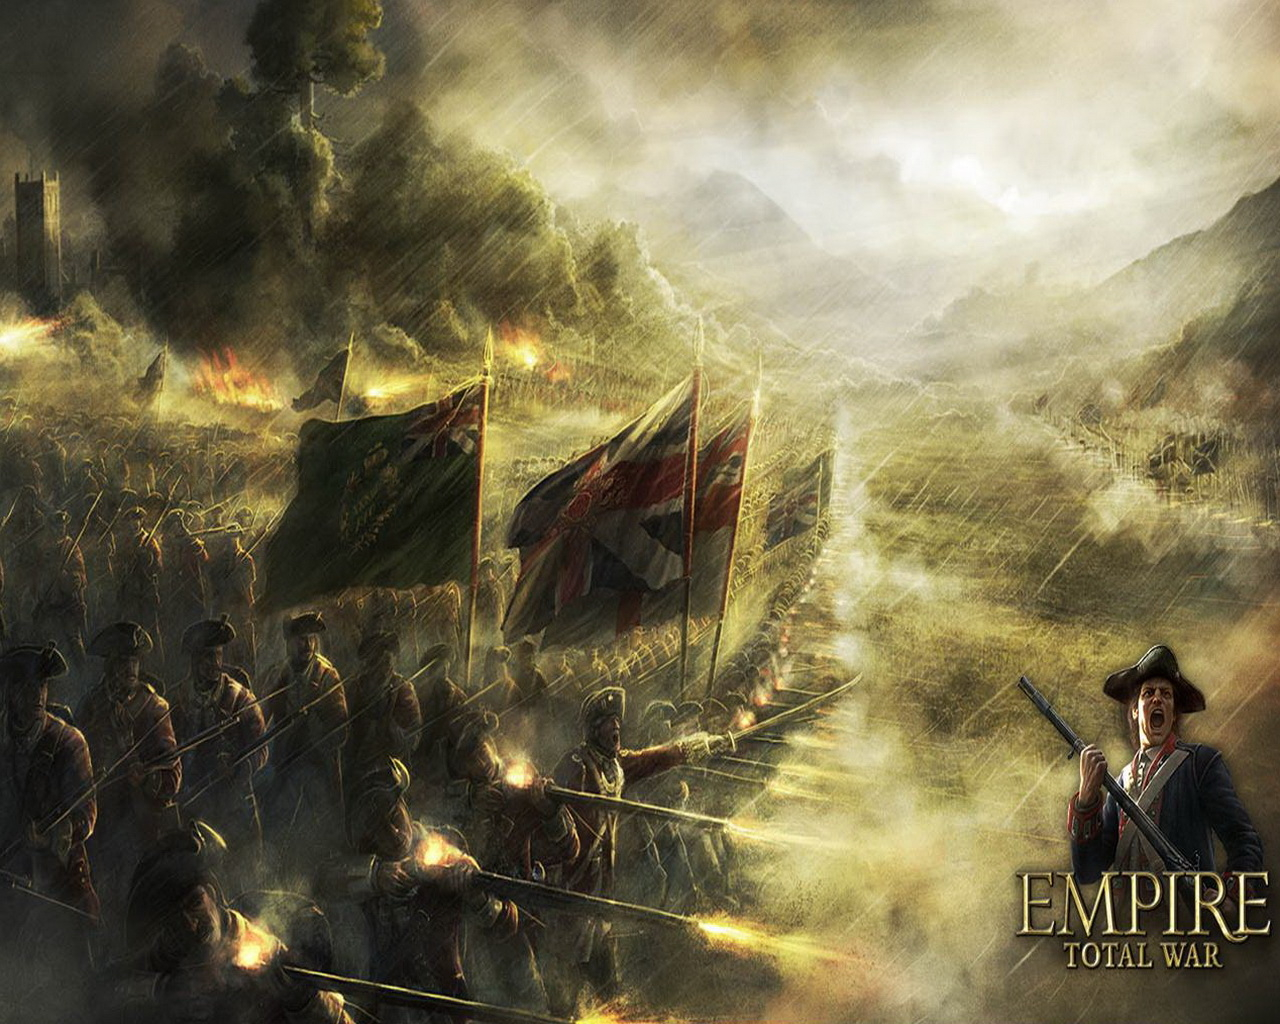 Empire Total War Desktop wallpapers 1280x1024 1280x1024